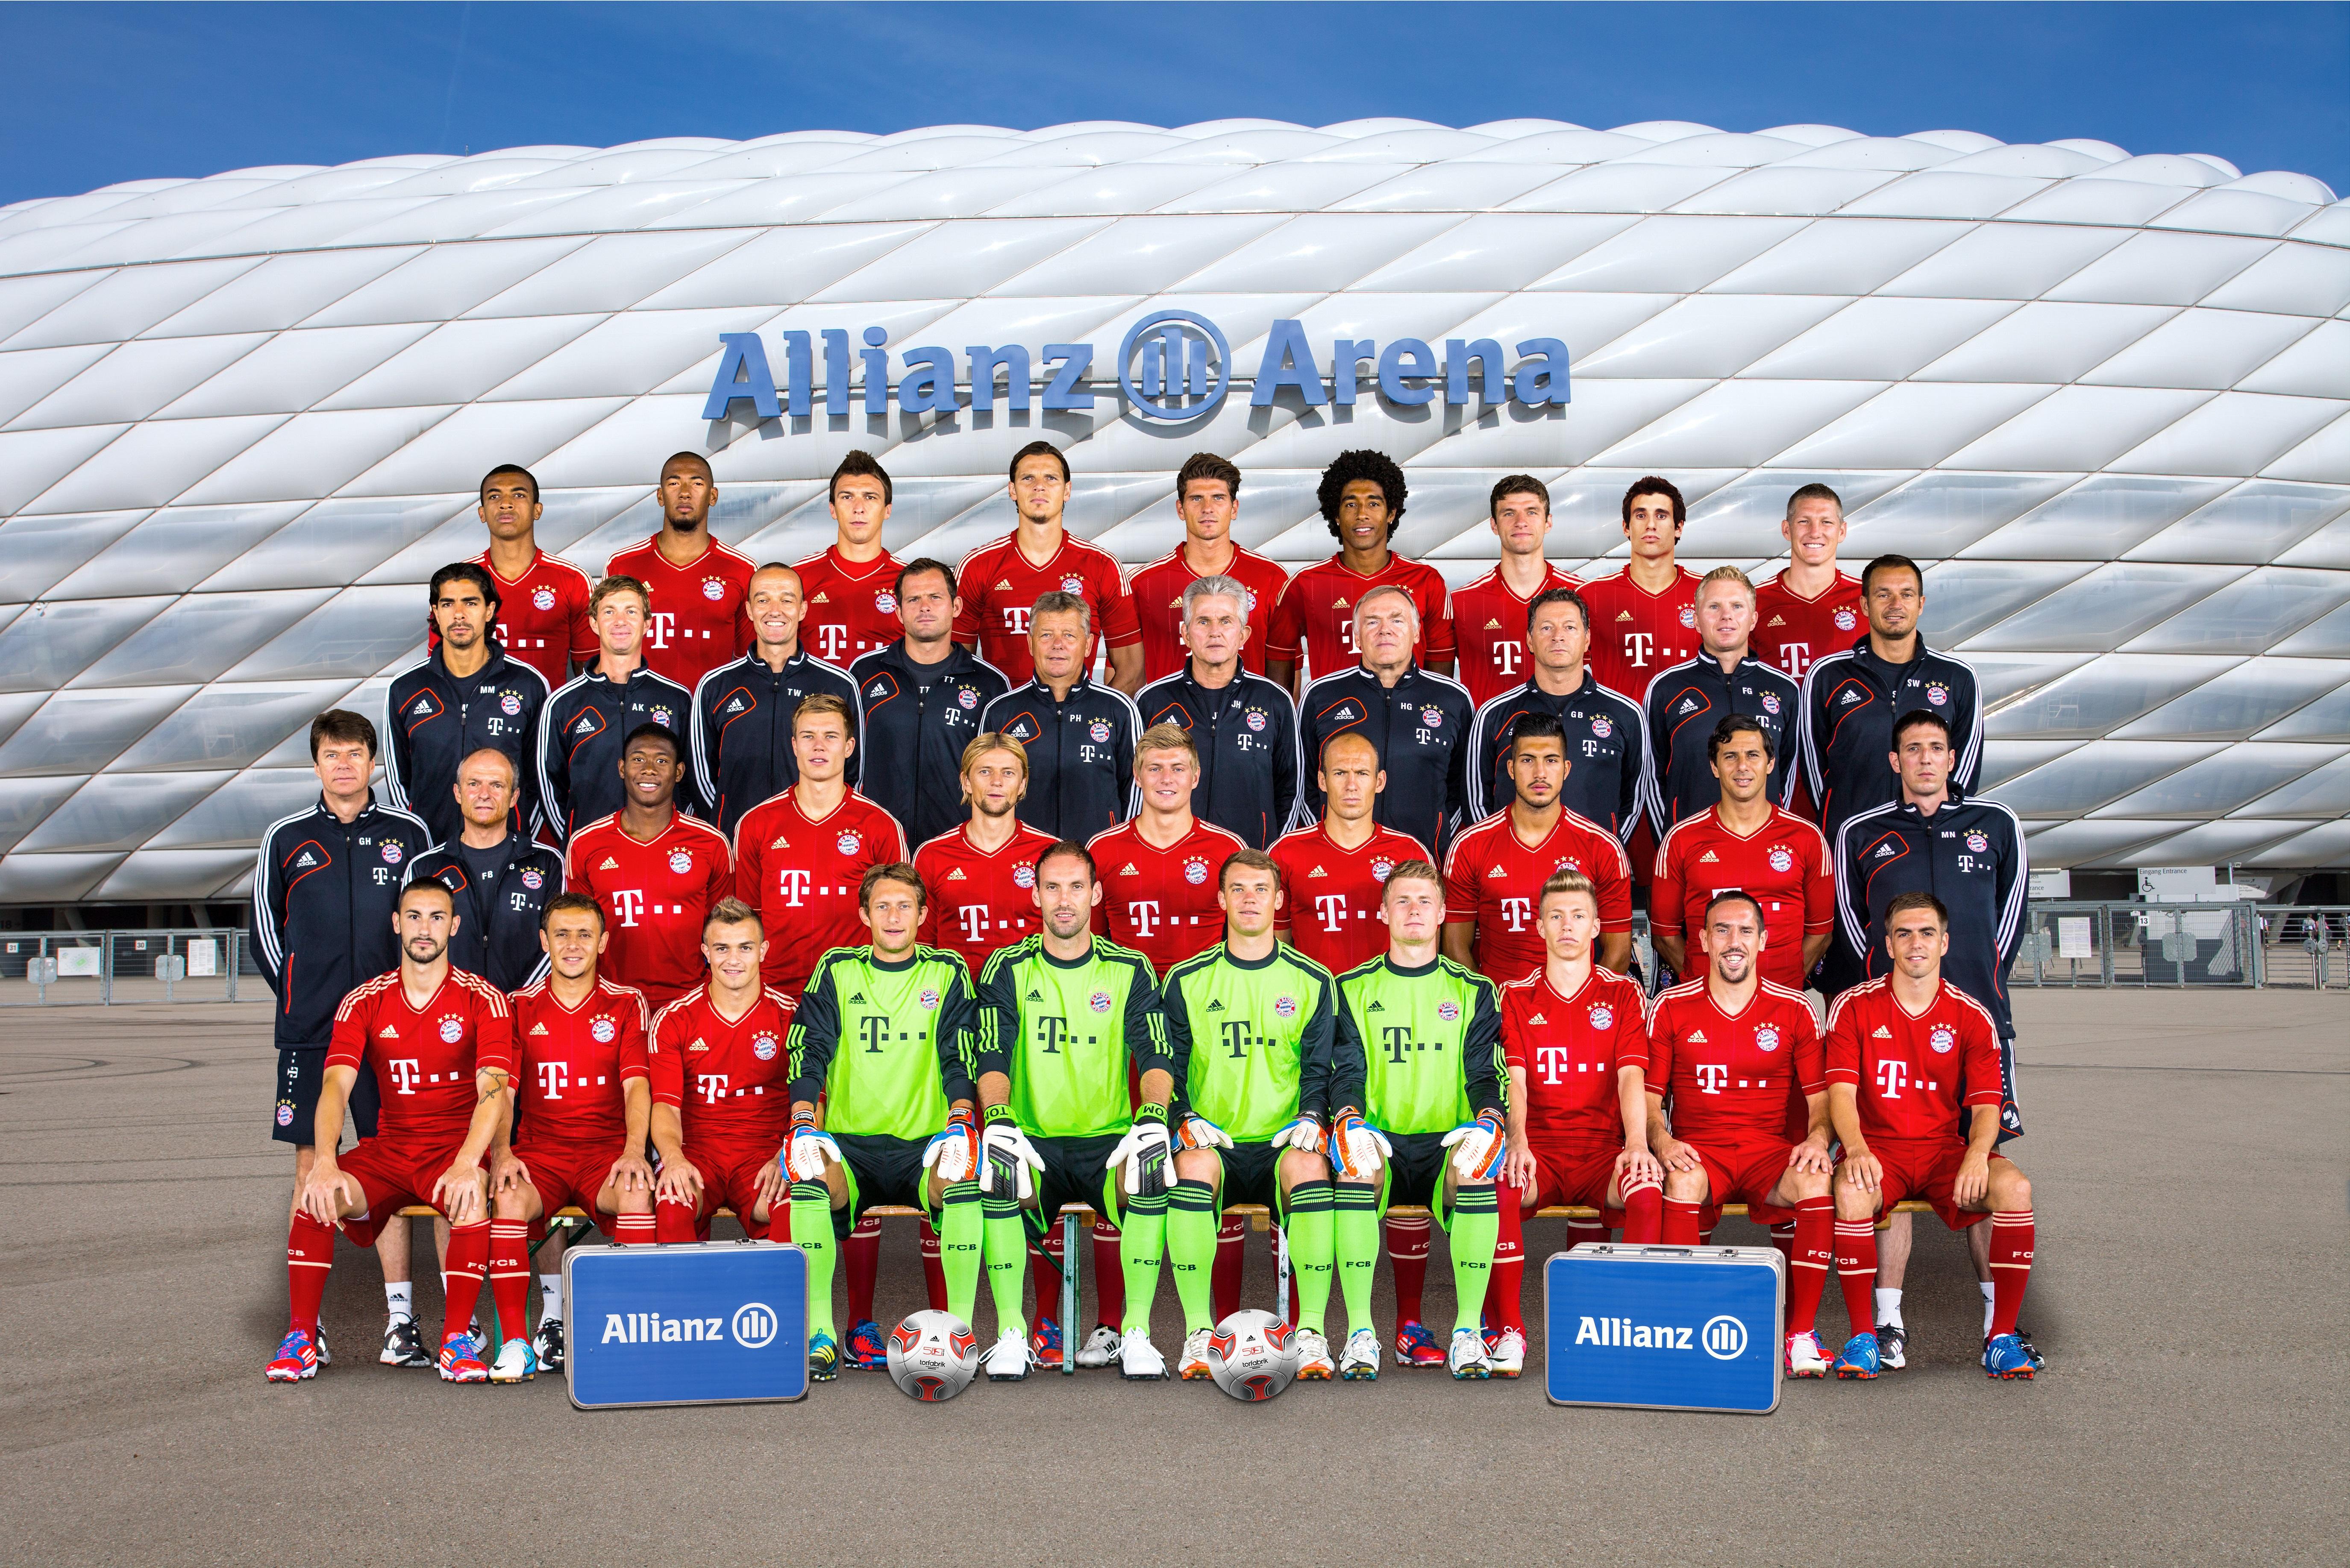 Bayern Munchen Hd Desktop